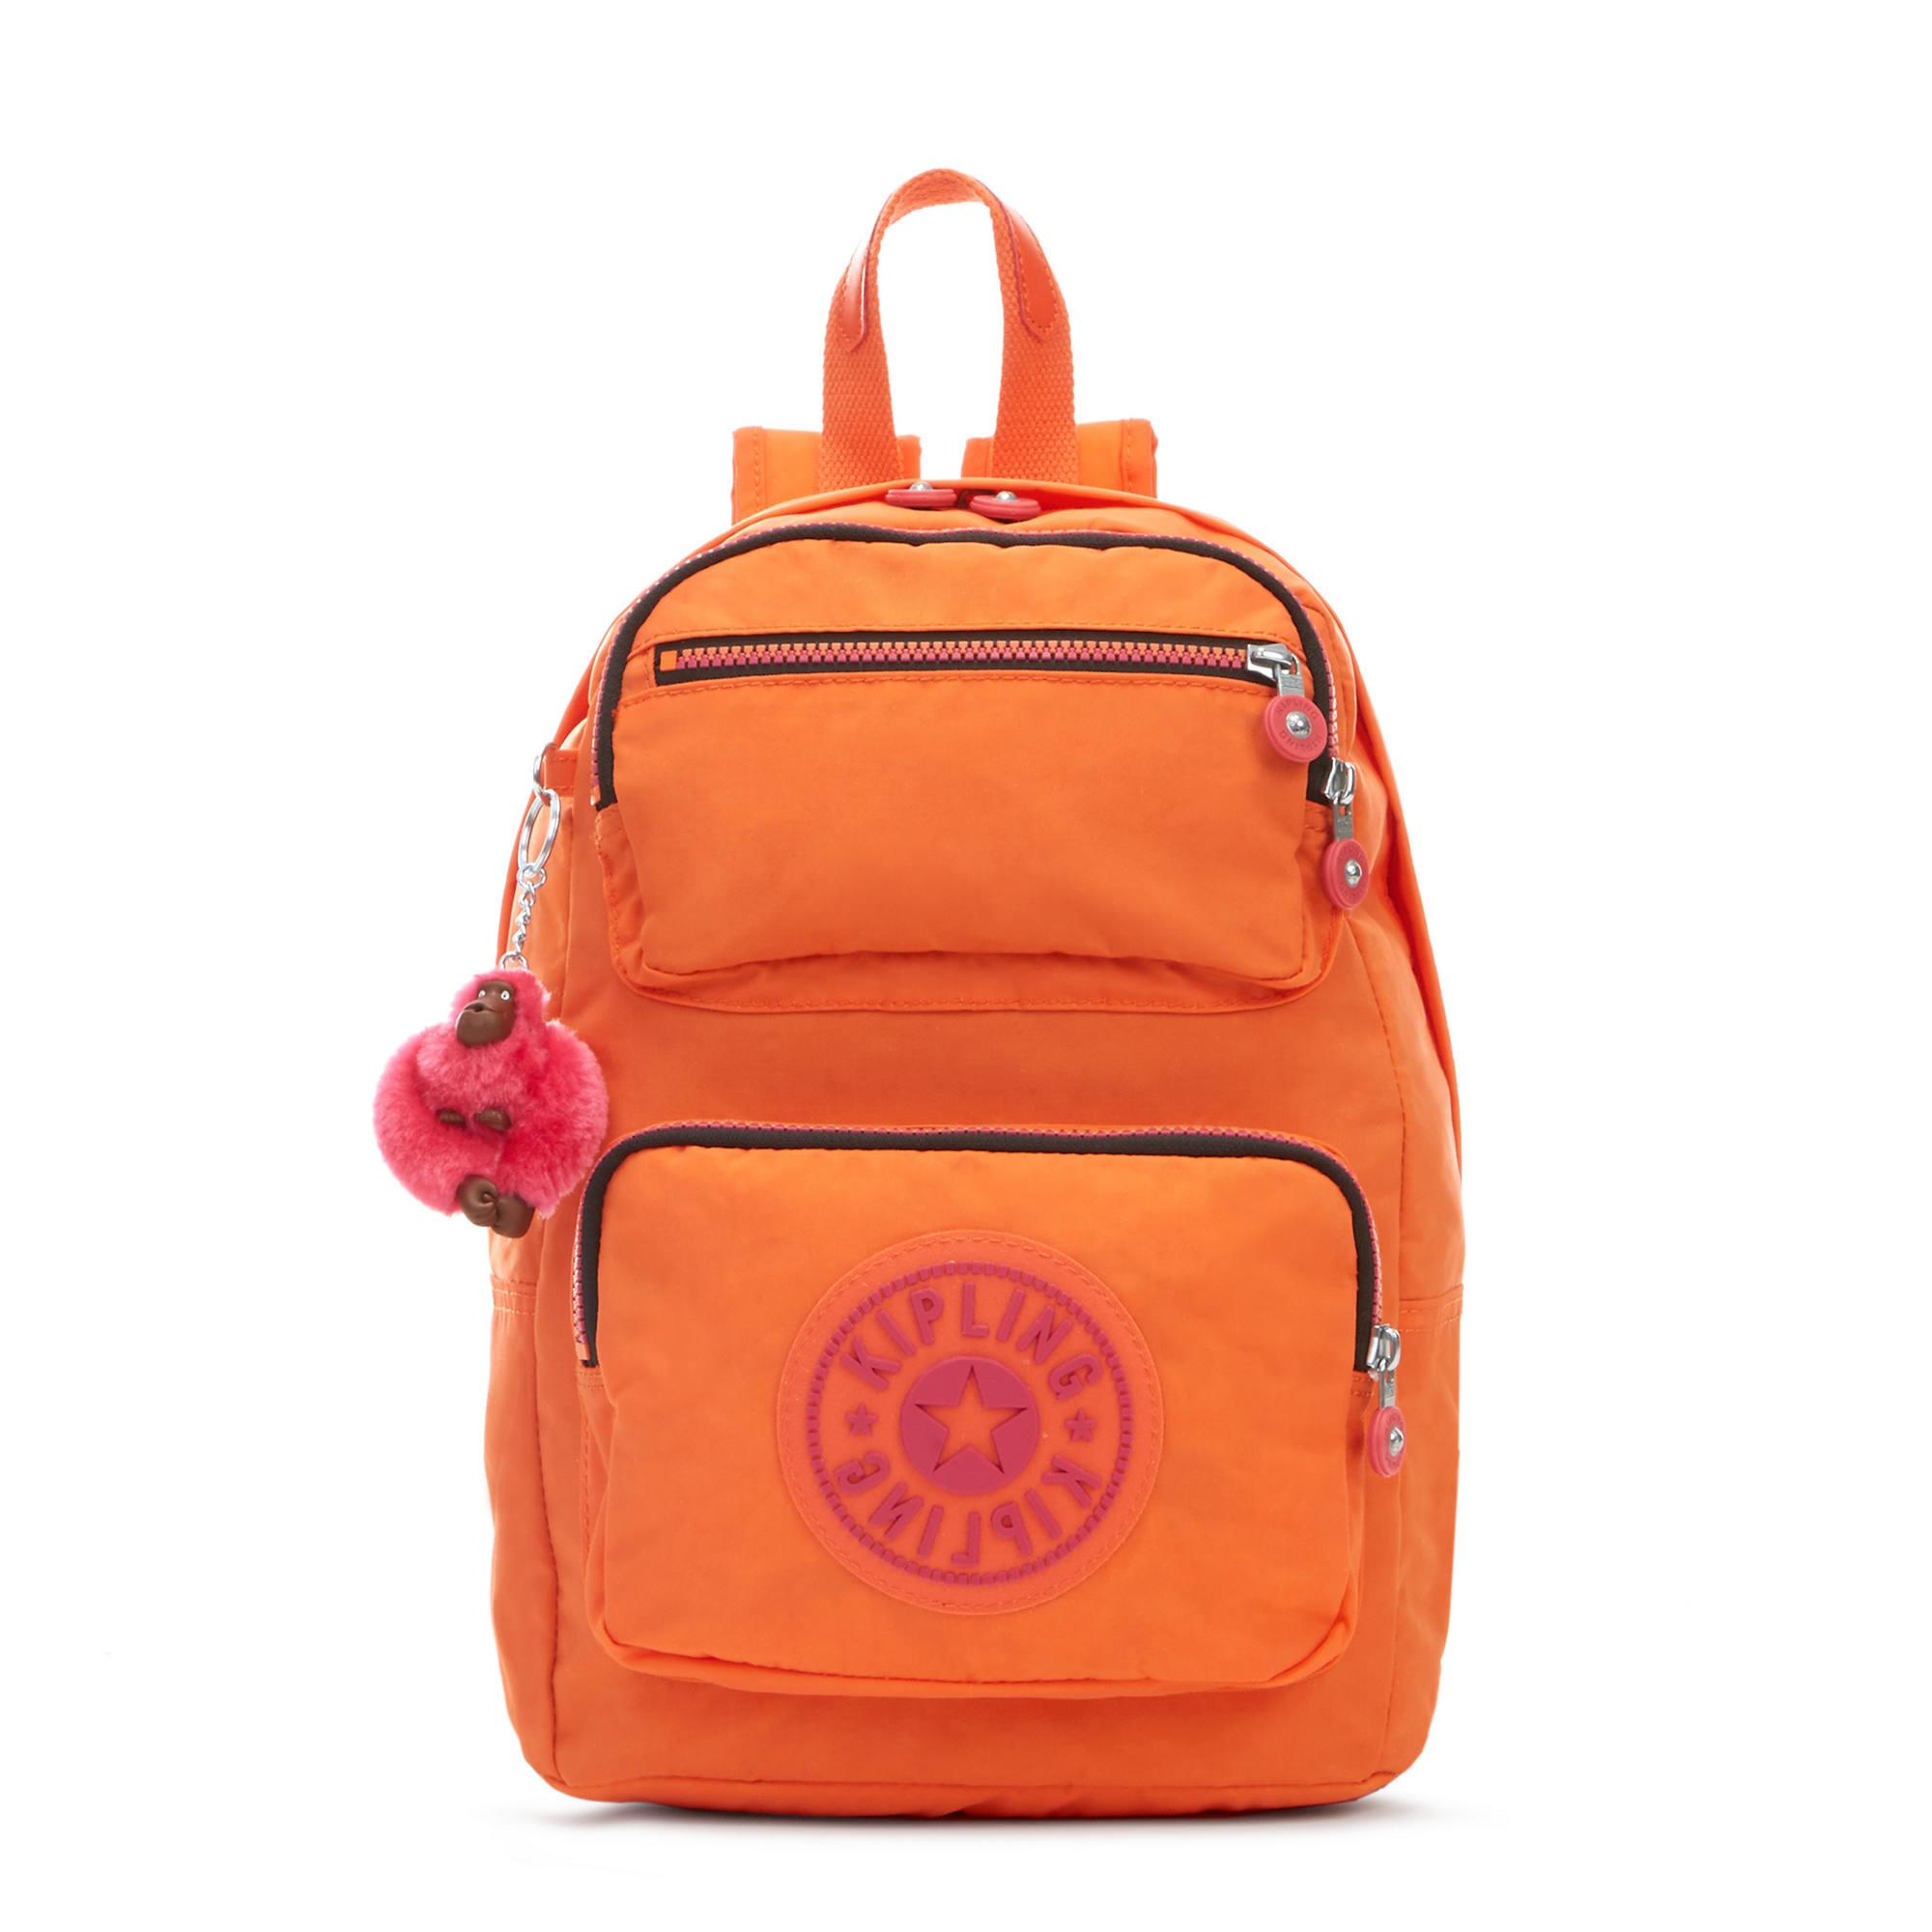 2000x2000 Dawson Small Backpack Kipling